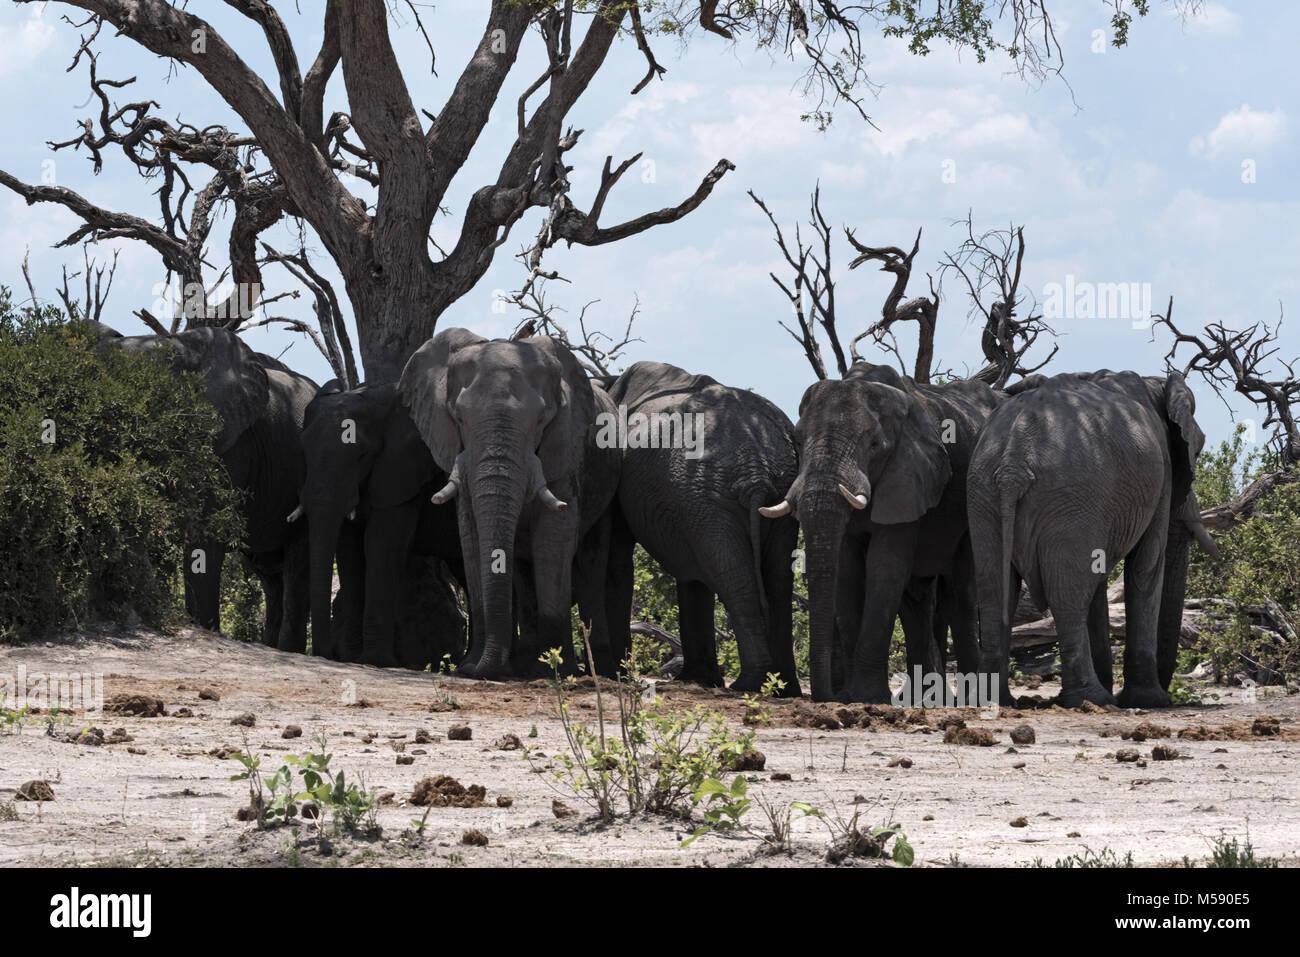 Elephants herd under a tree group in Chobe National Park, Botswana - Stock Image